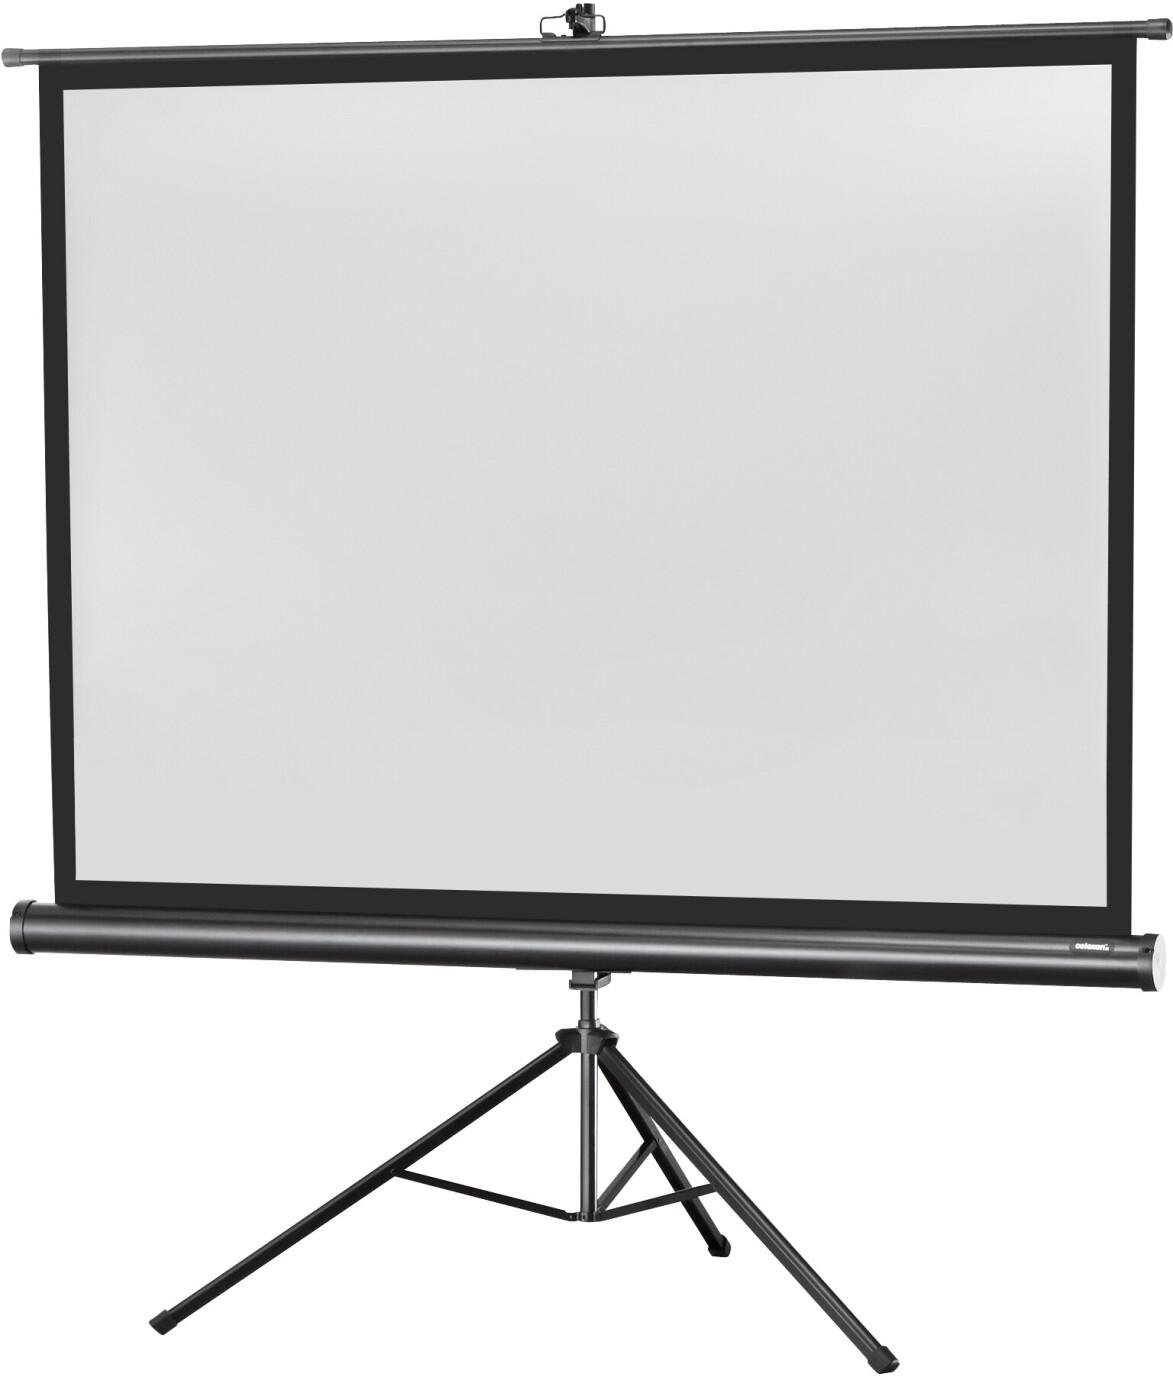 celexon Stativleinwand Economy 211 x 160 cm